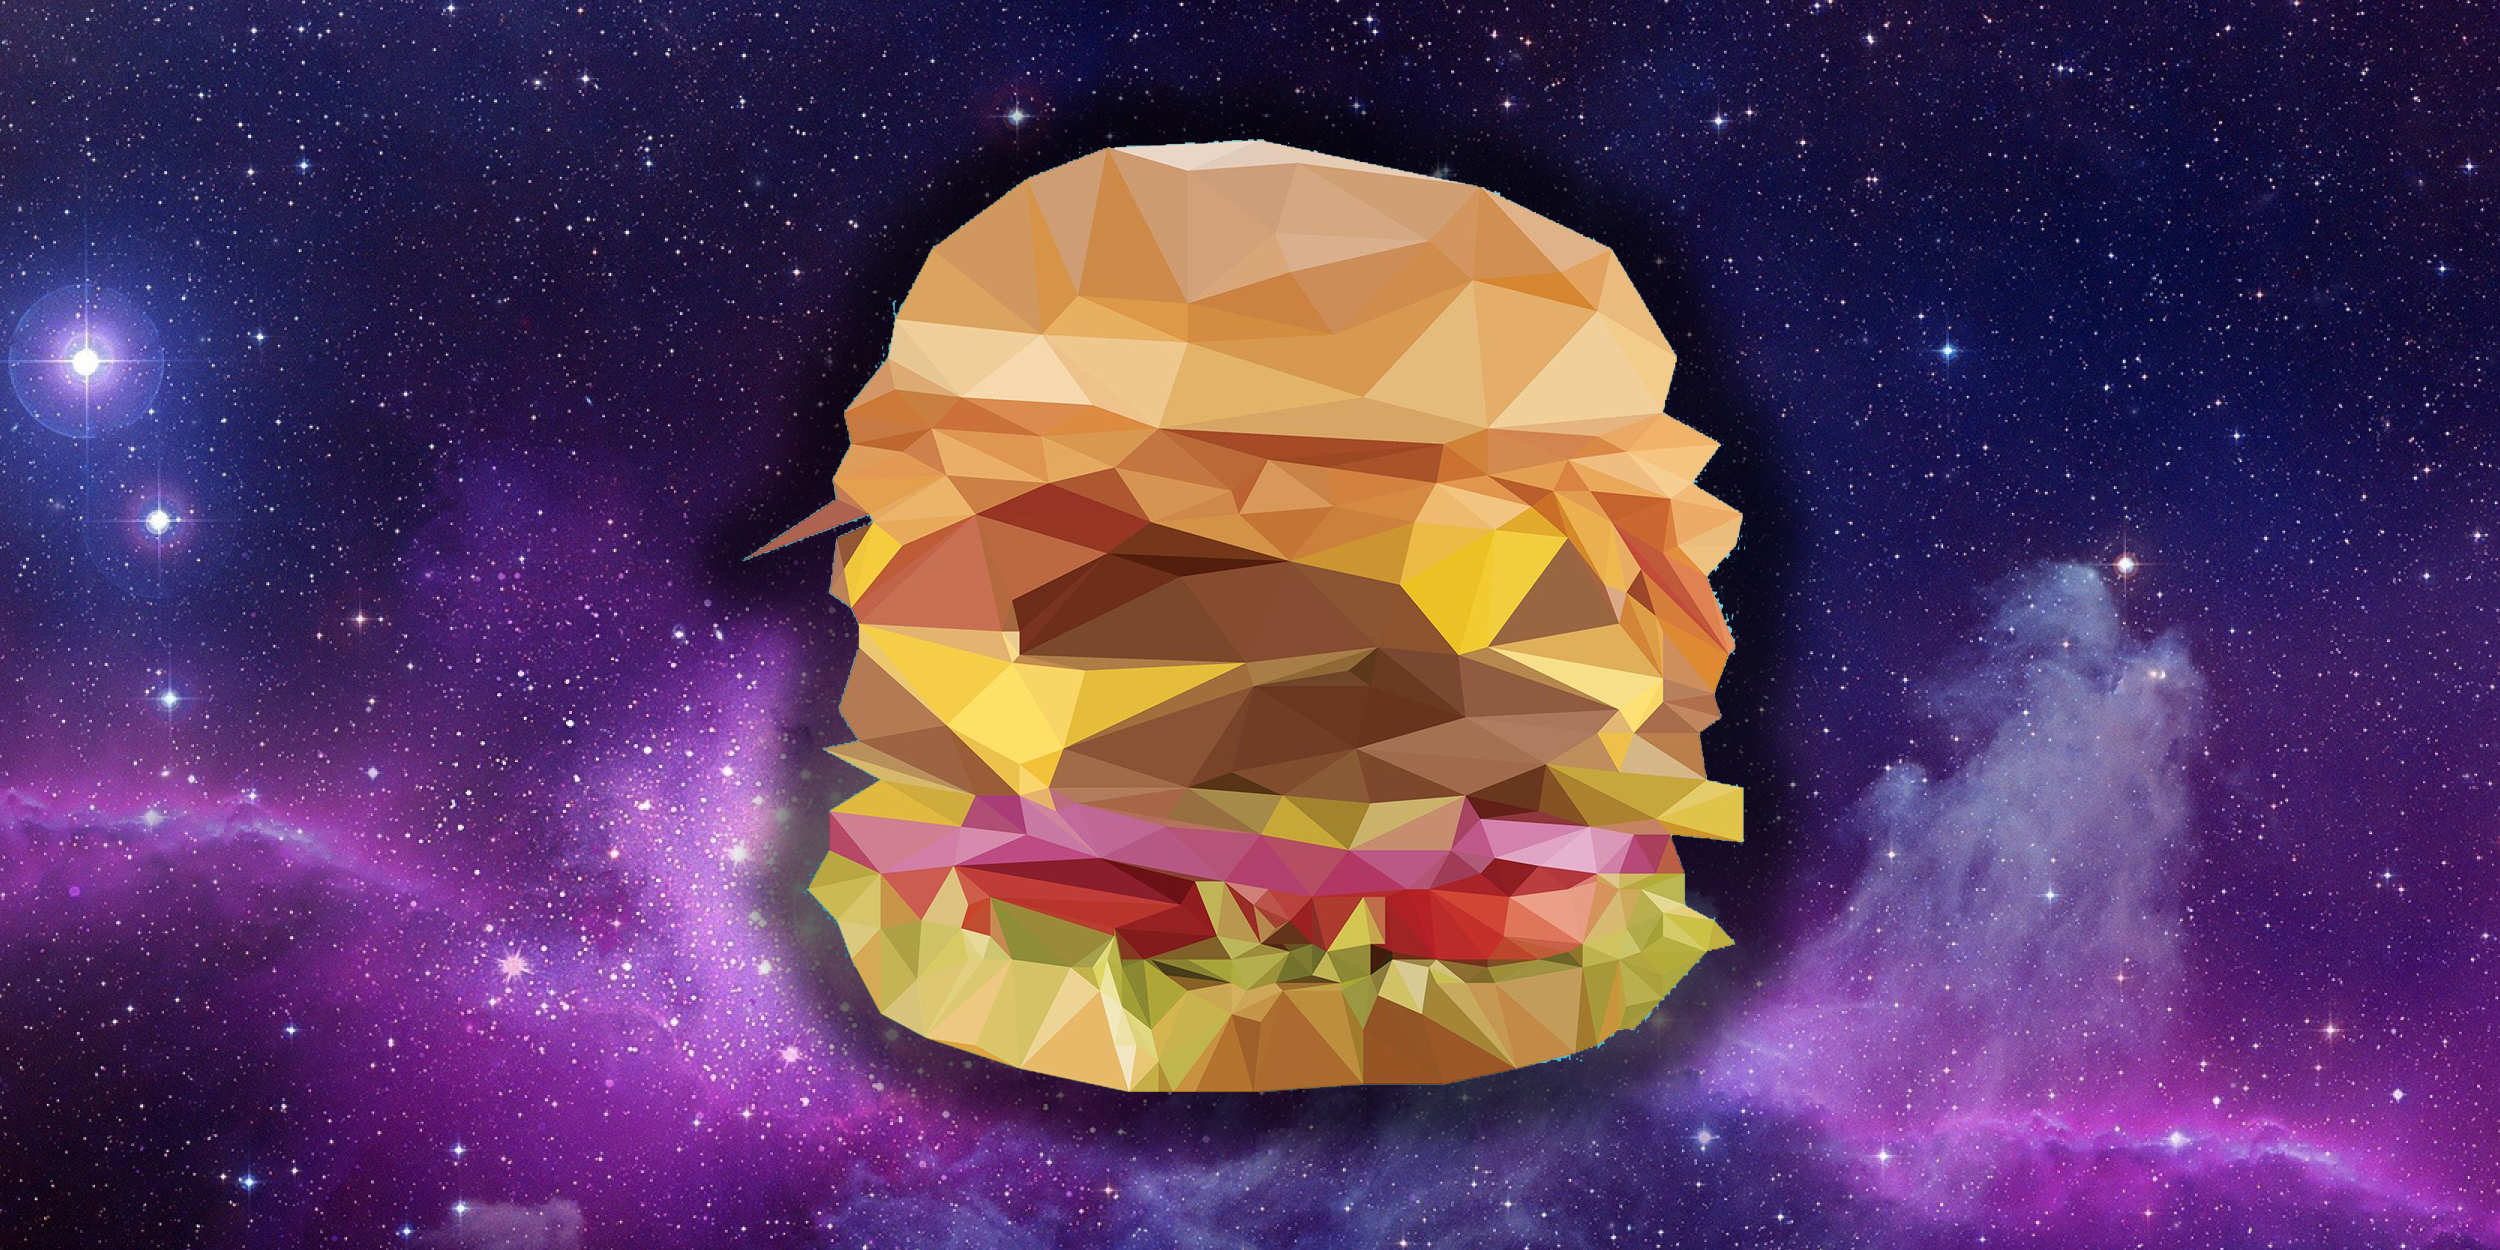 Пикник на Марсе. Может ли еда стать вкуснее на другой планете?